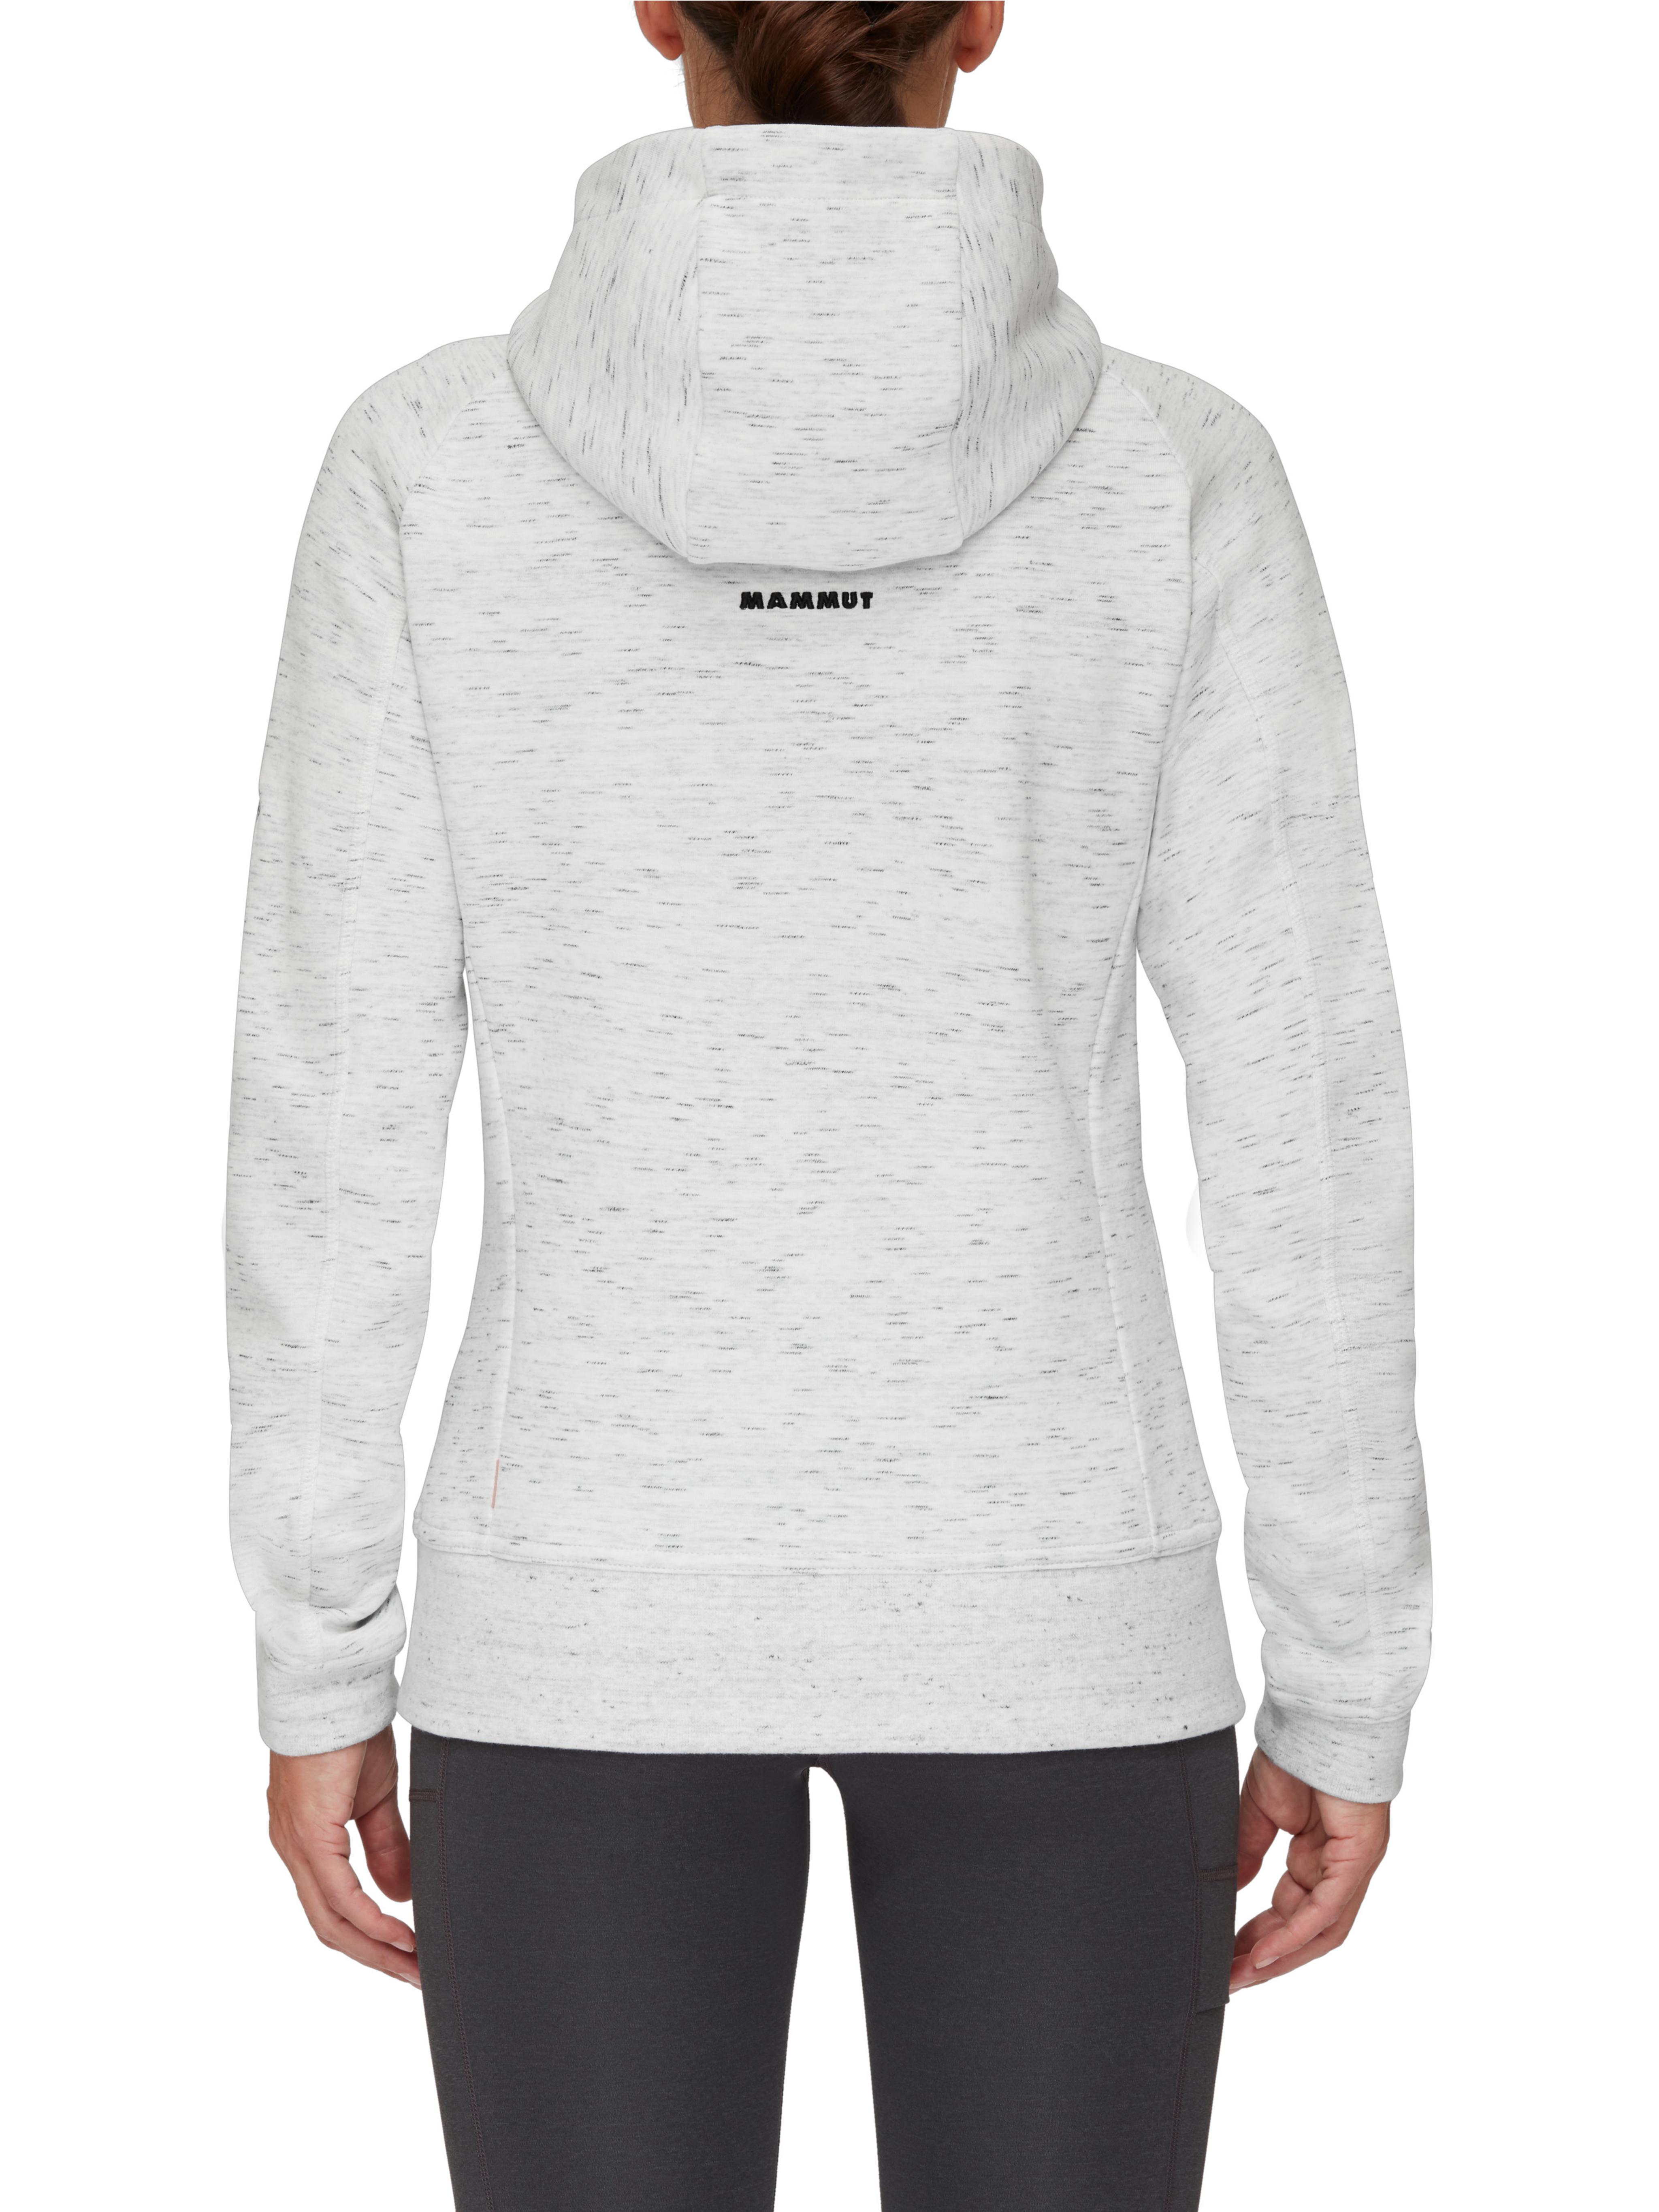 Dyno ML Hooded Jacket Women product image